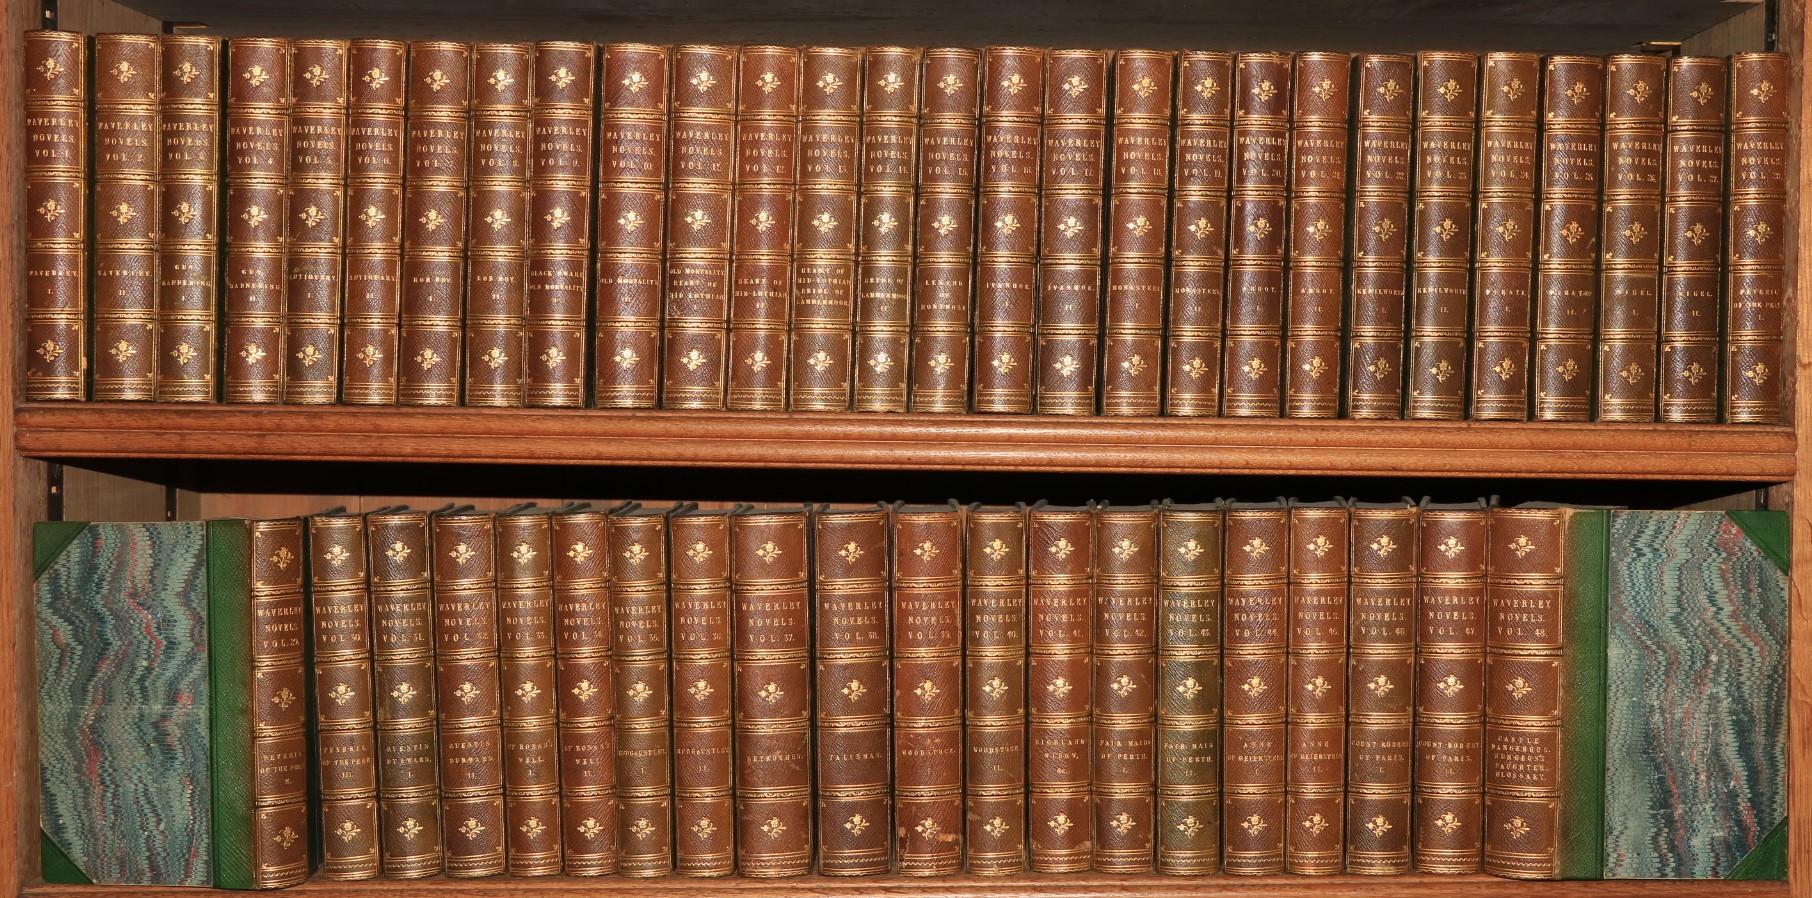 Bindings:ÿ Scott (Sir W.)ÿWaverley Novels, 48 vols. 12mo Edinburgh 1830, Engd. add. titles, - Image 4 of 5